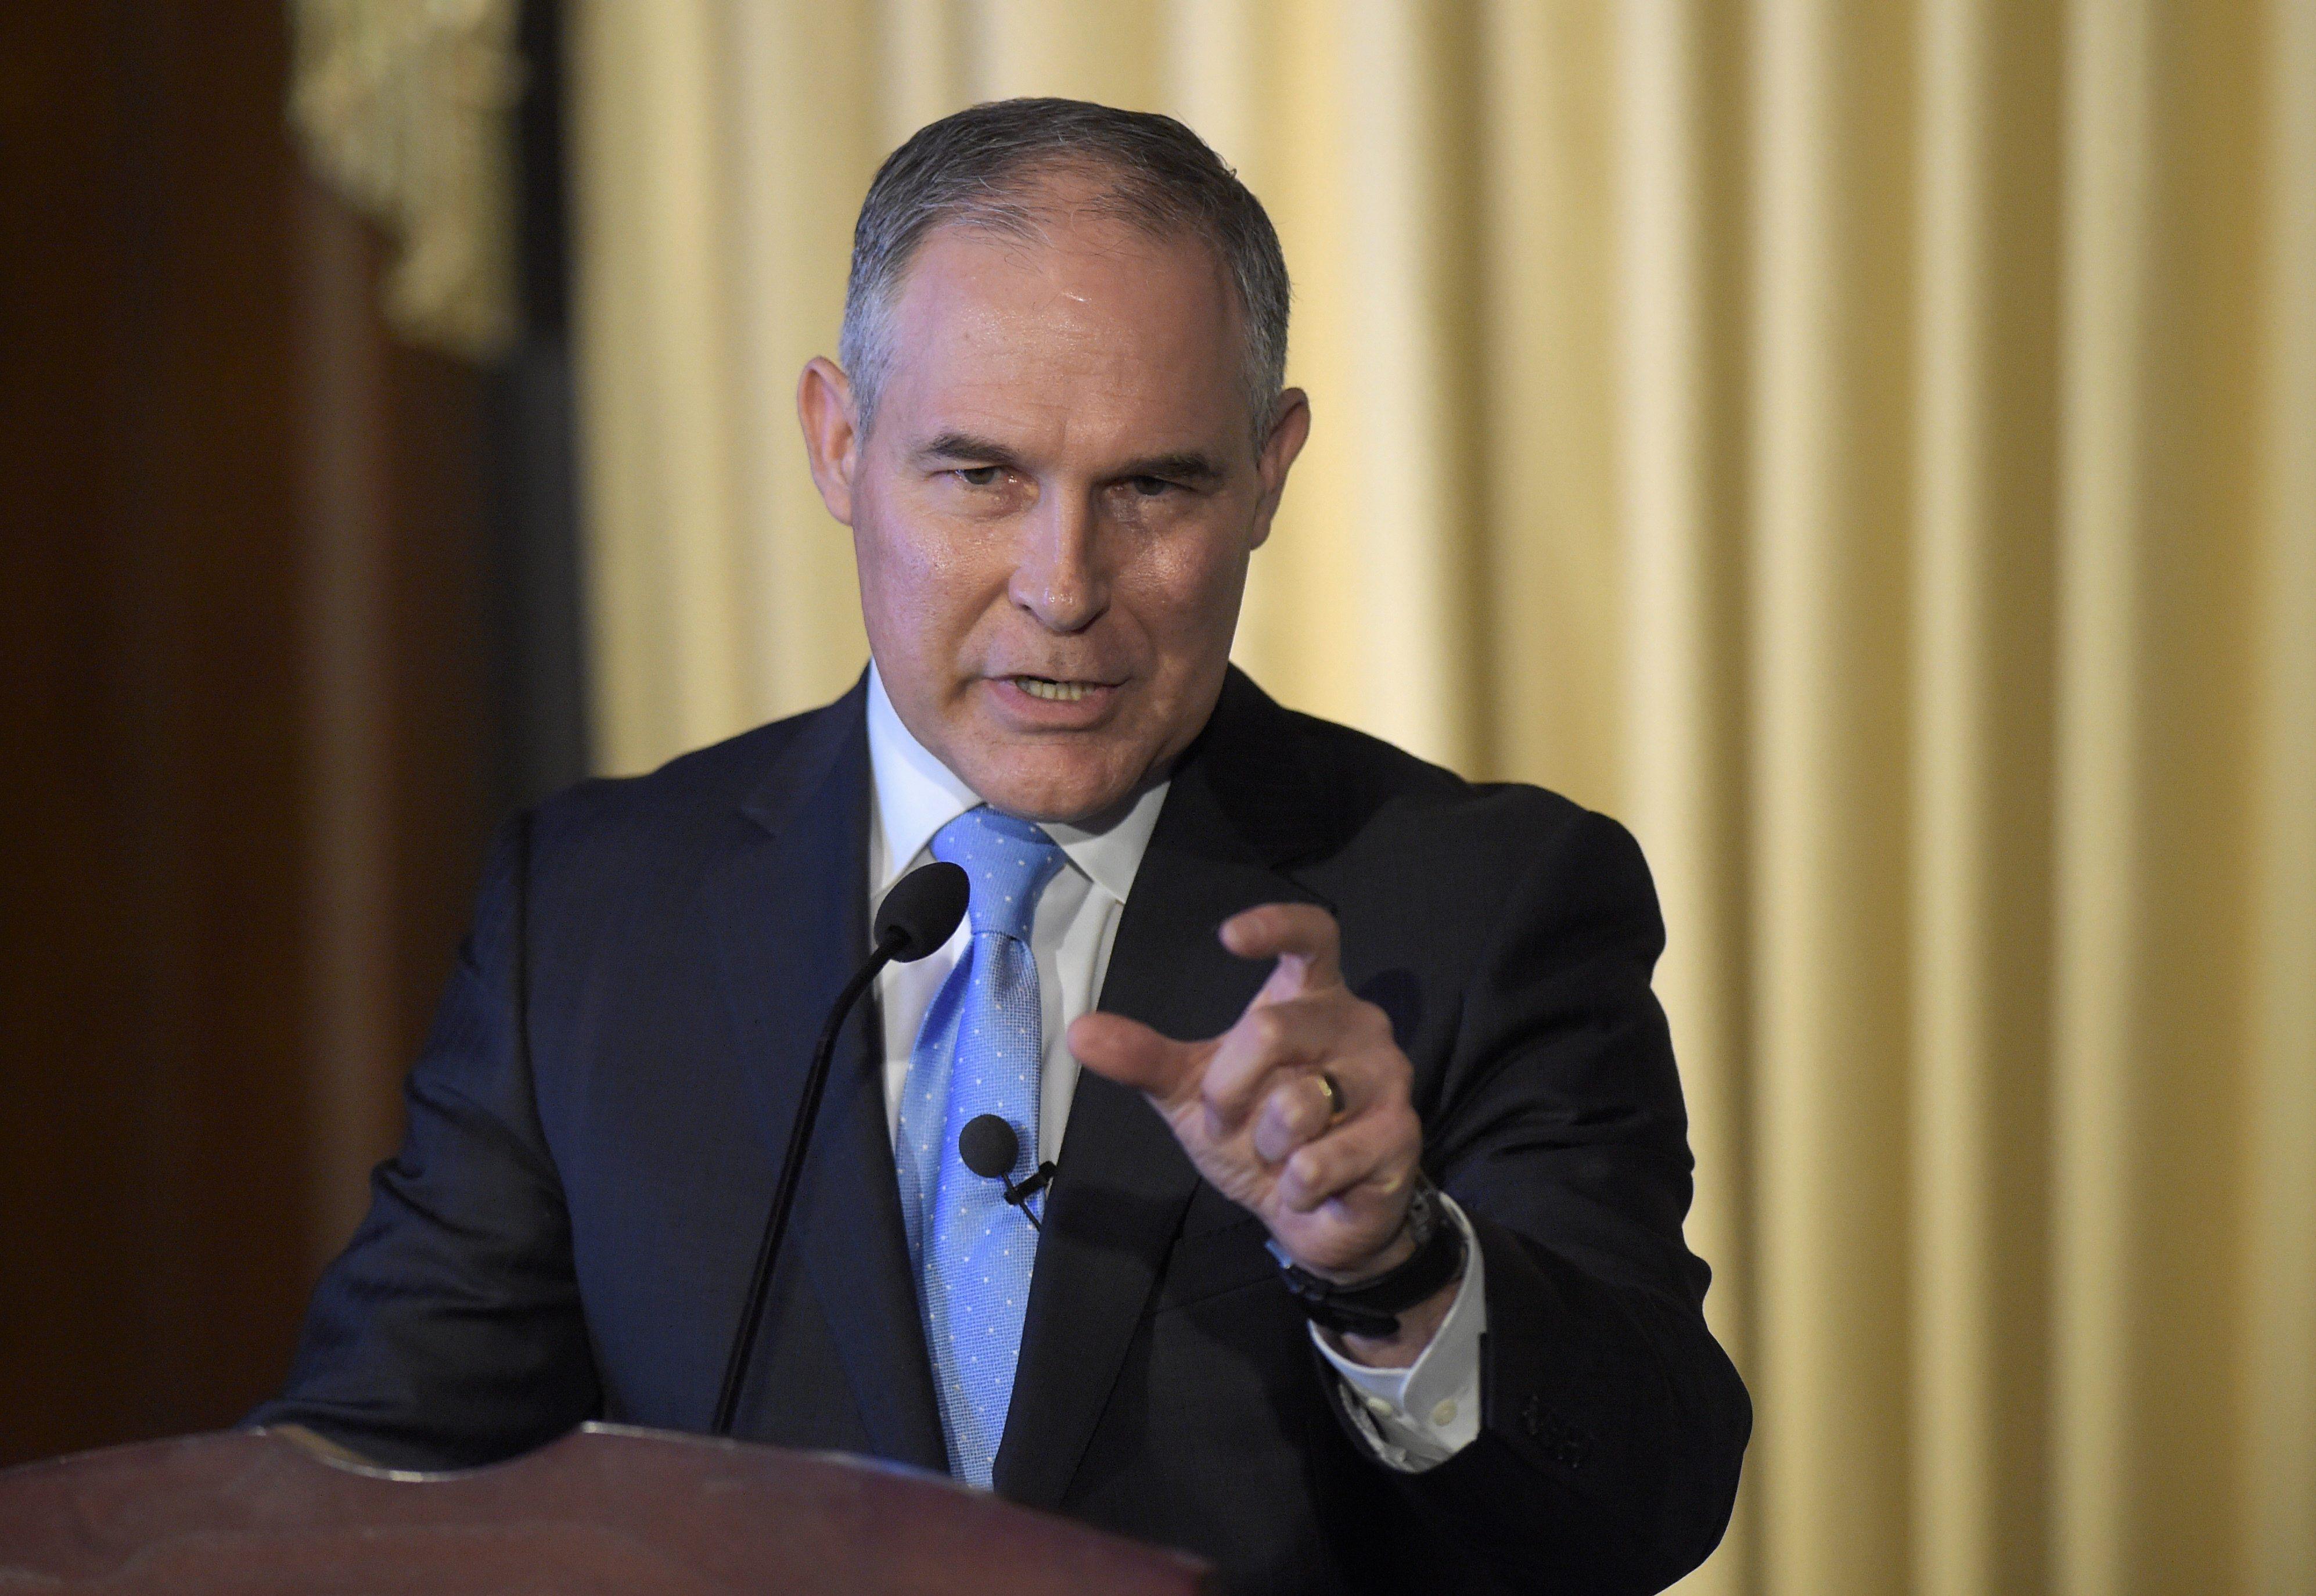 Scott Pruitt\u0027s EPA faces harshest budget cuts in history ...